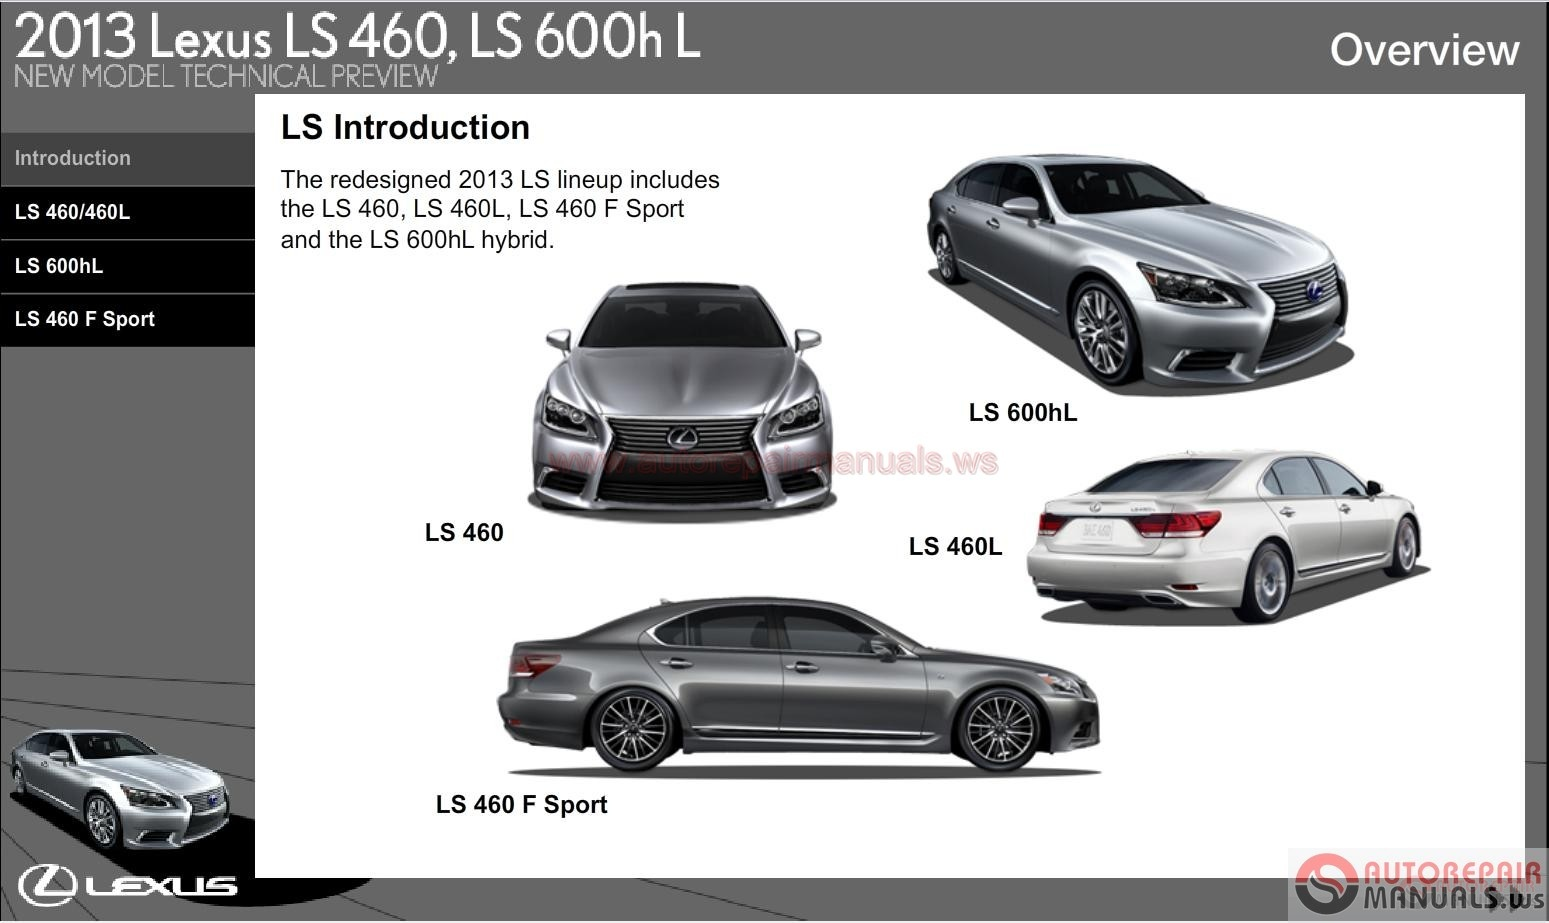 Lexus Ls460 Ls460hl New Model Technical Preview